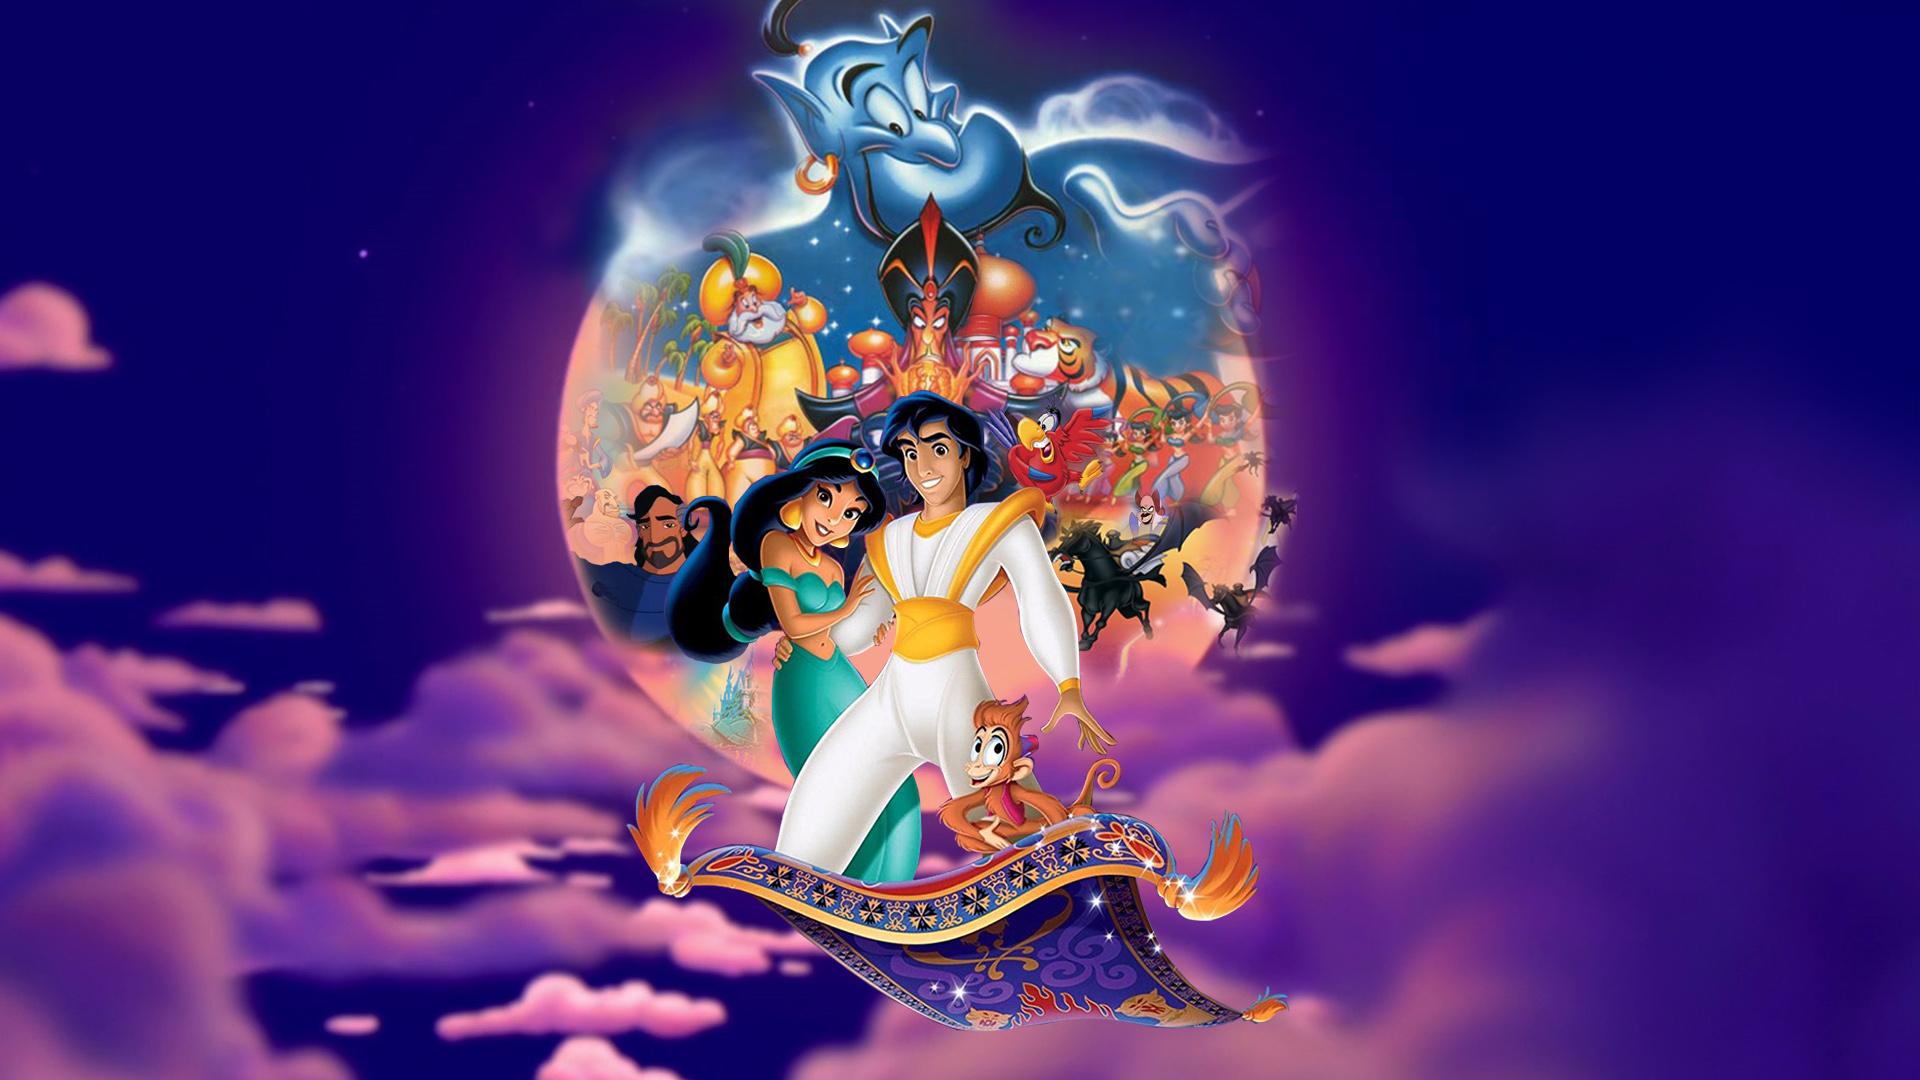 Aladdin Trilogy Wallpaper By The Dark Mamba 995 On Deviantart